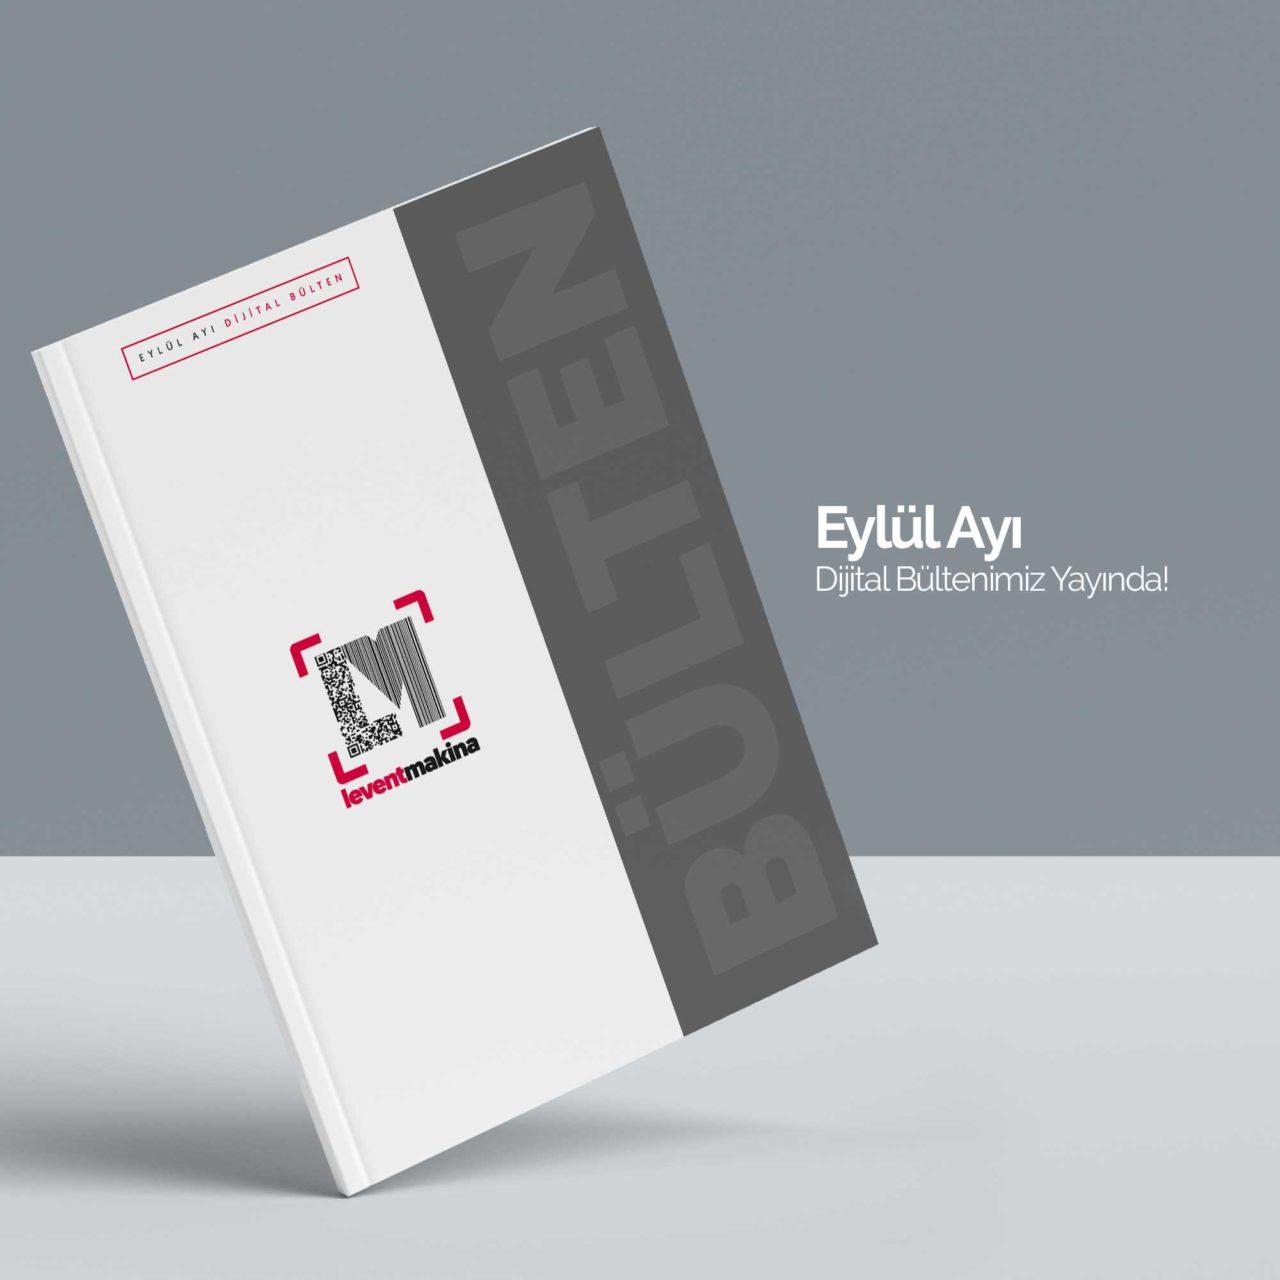 https://leventmakina.com.tr/wp-content/uploads/2020/09/Levent-Makina-Eylul-Ayi-Dijital-Bulten-1280x1280.jpg